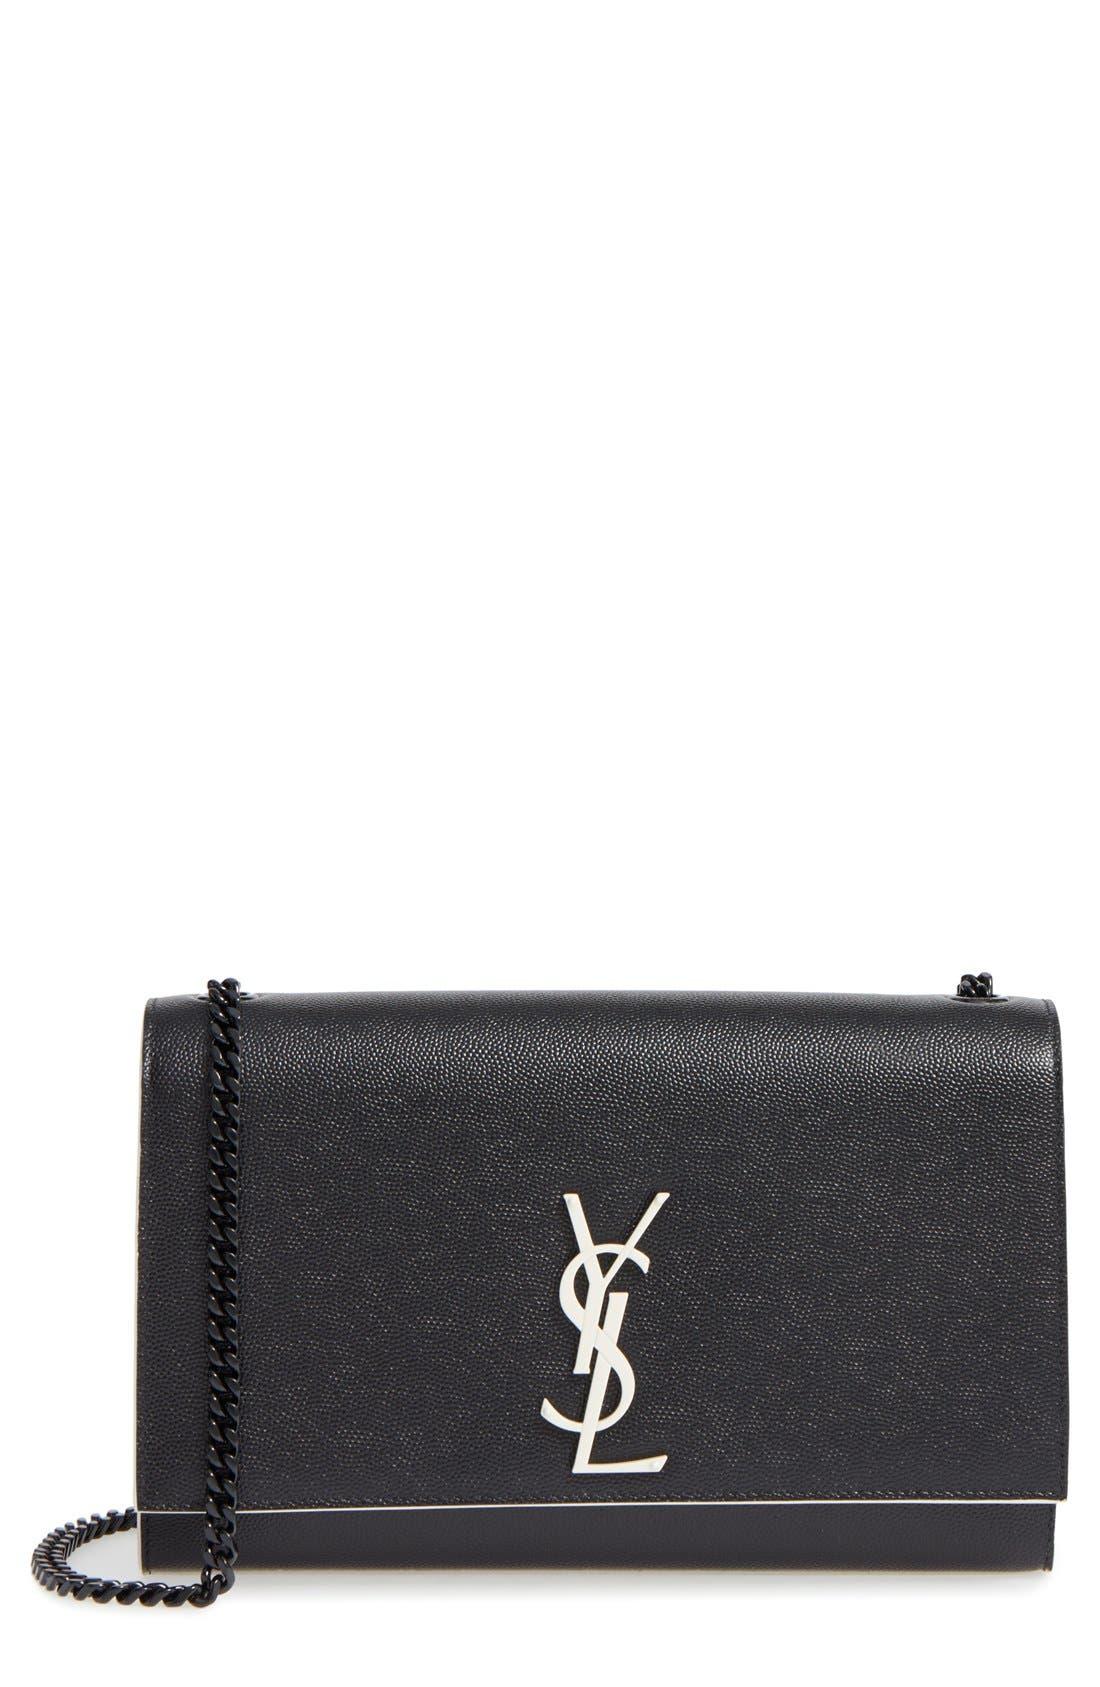 Main Image - Saint Laurent Medium Kate Grainy Leather Shoulder Bag